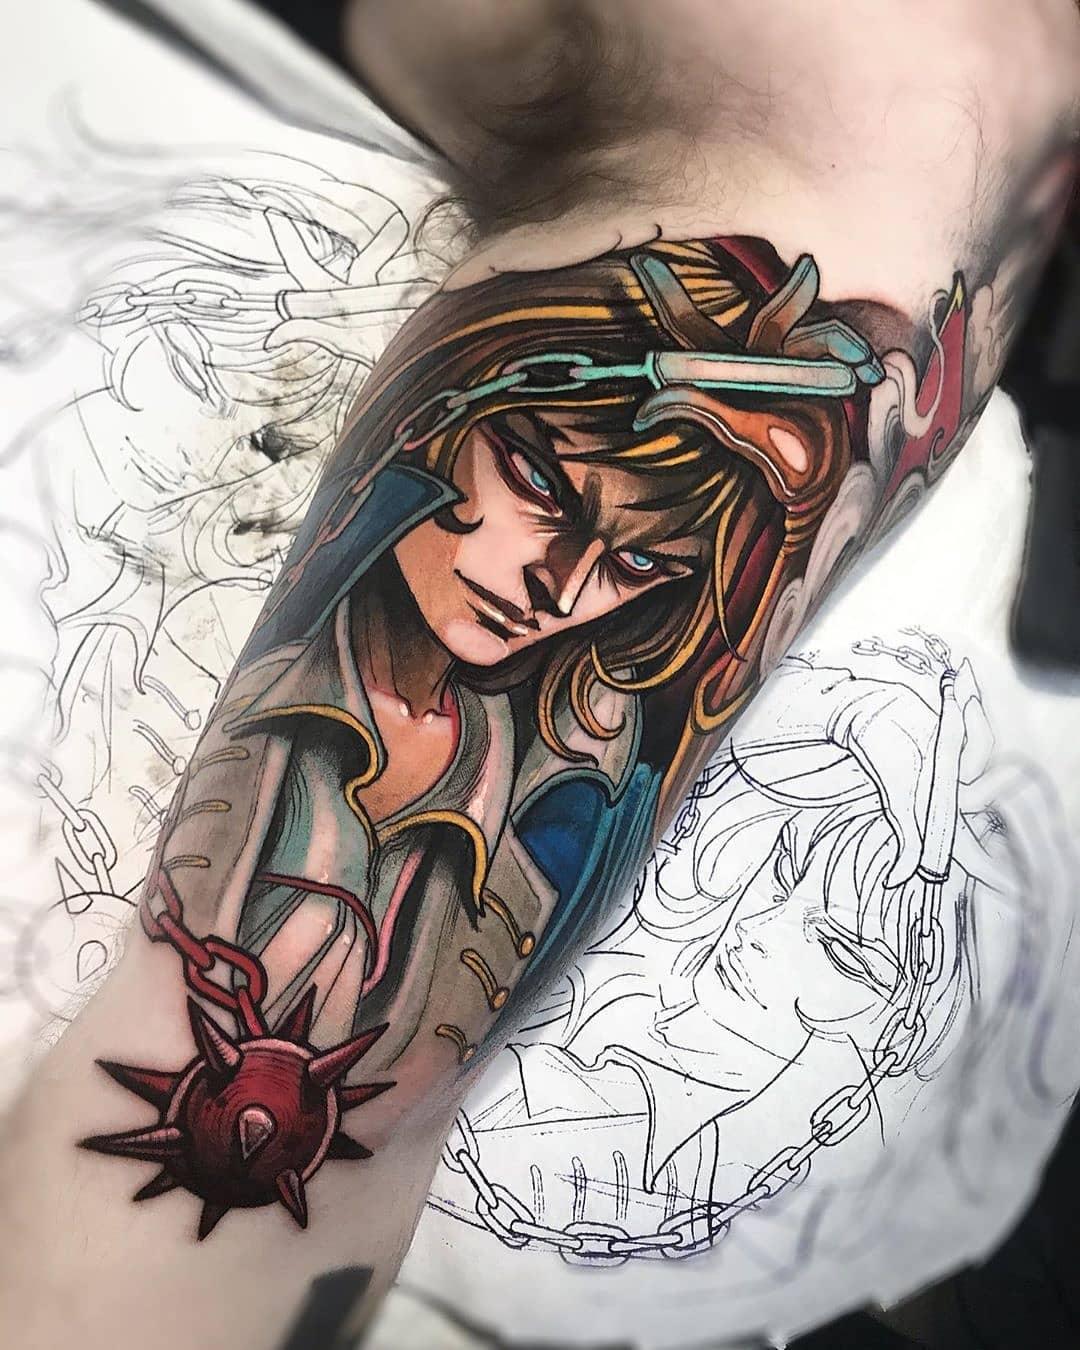 Trevor Belmont tattoo